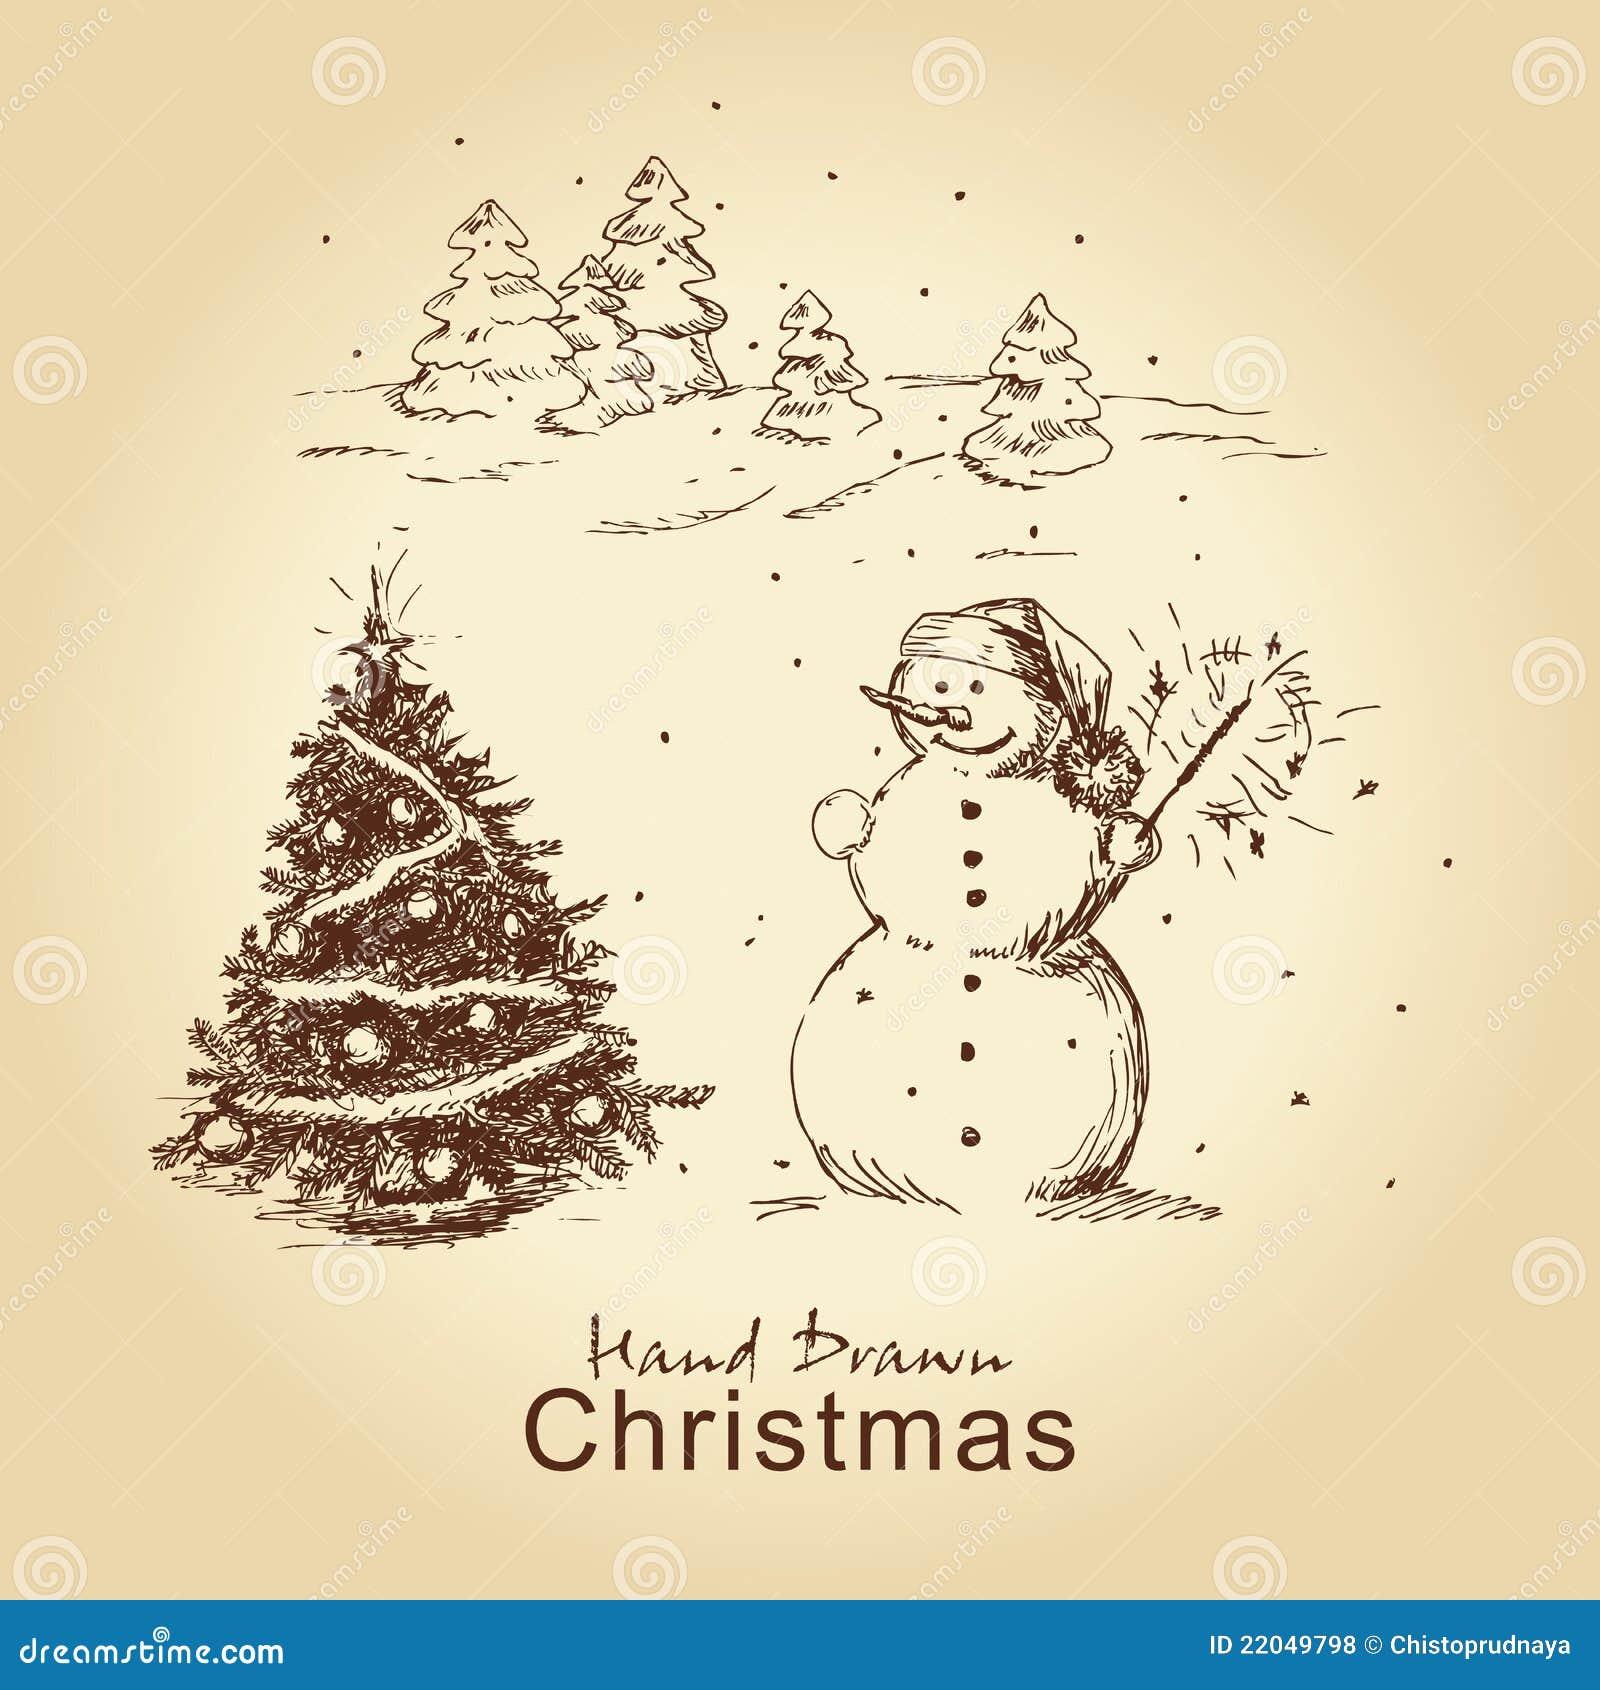 Christmas hand drawn card royalty free stock photos image 22049798